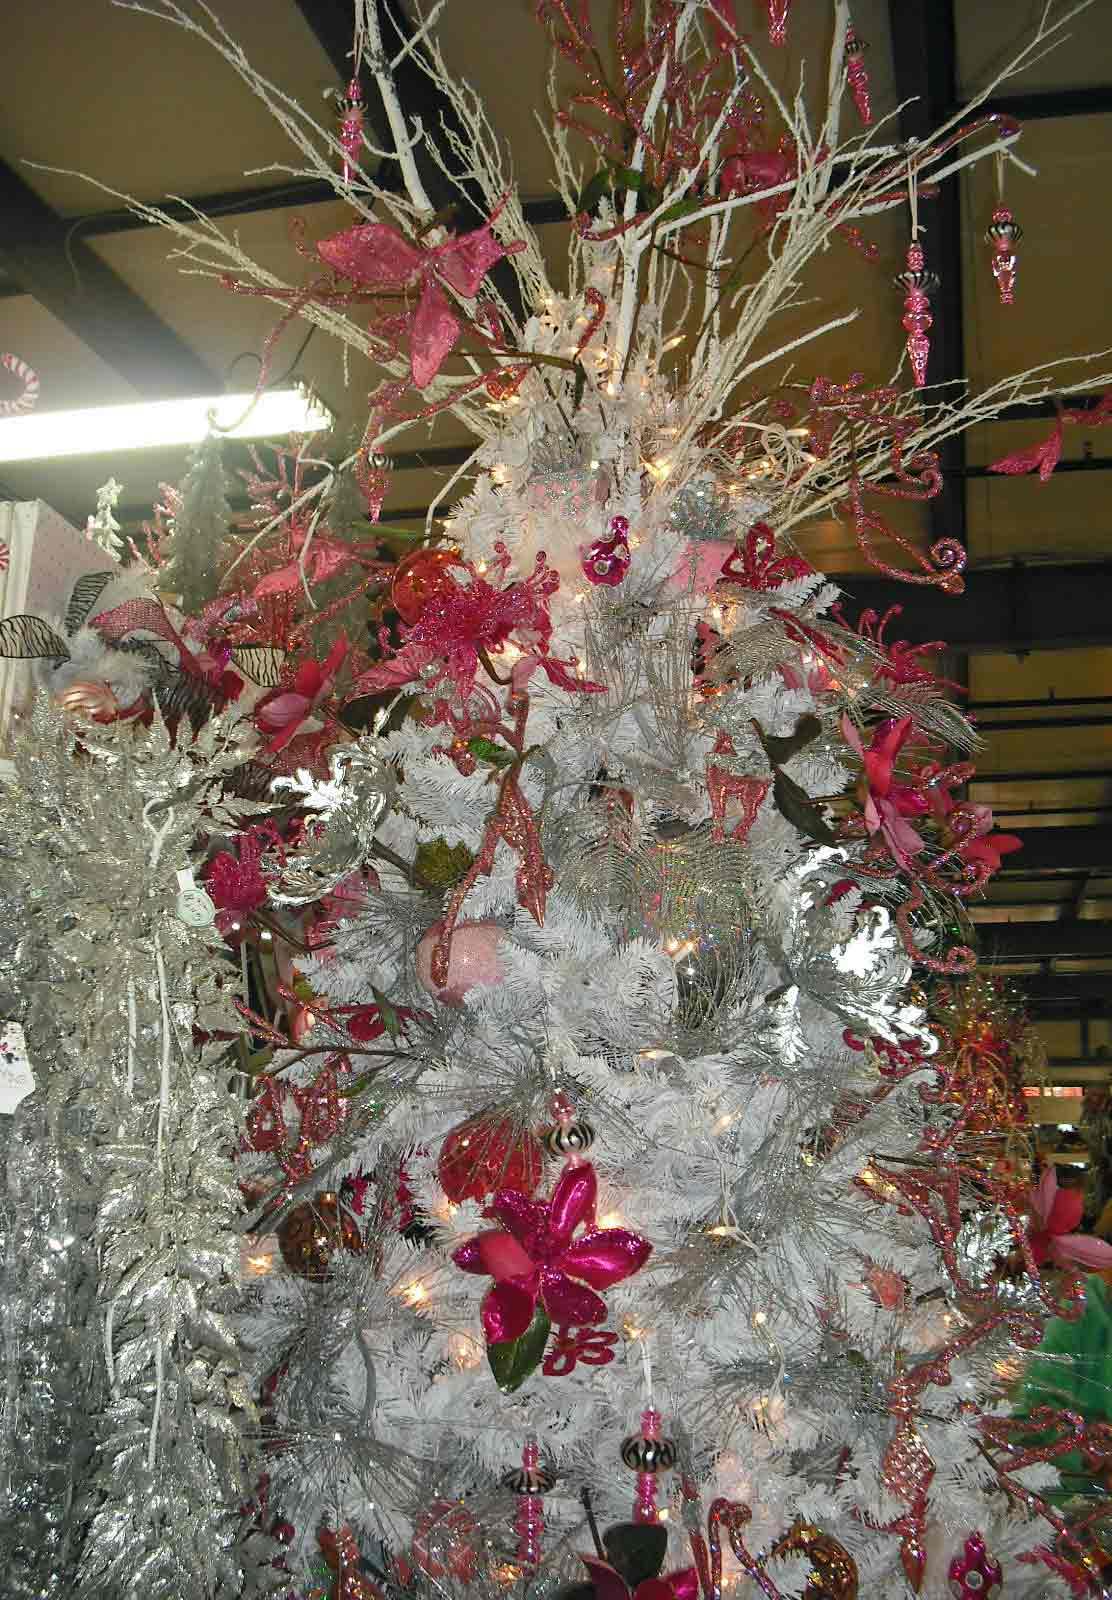 Studio b uberart twelve days of christmas trees day 8 for 12 days of christmas table cloth